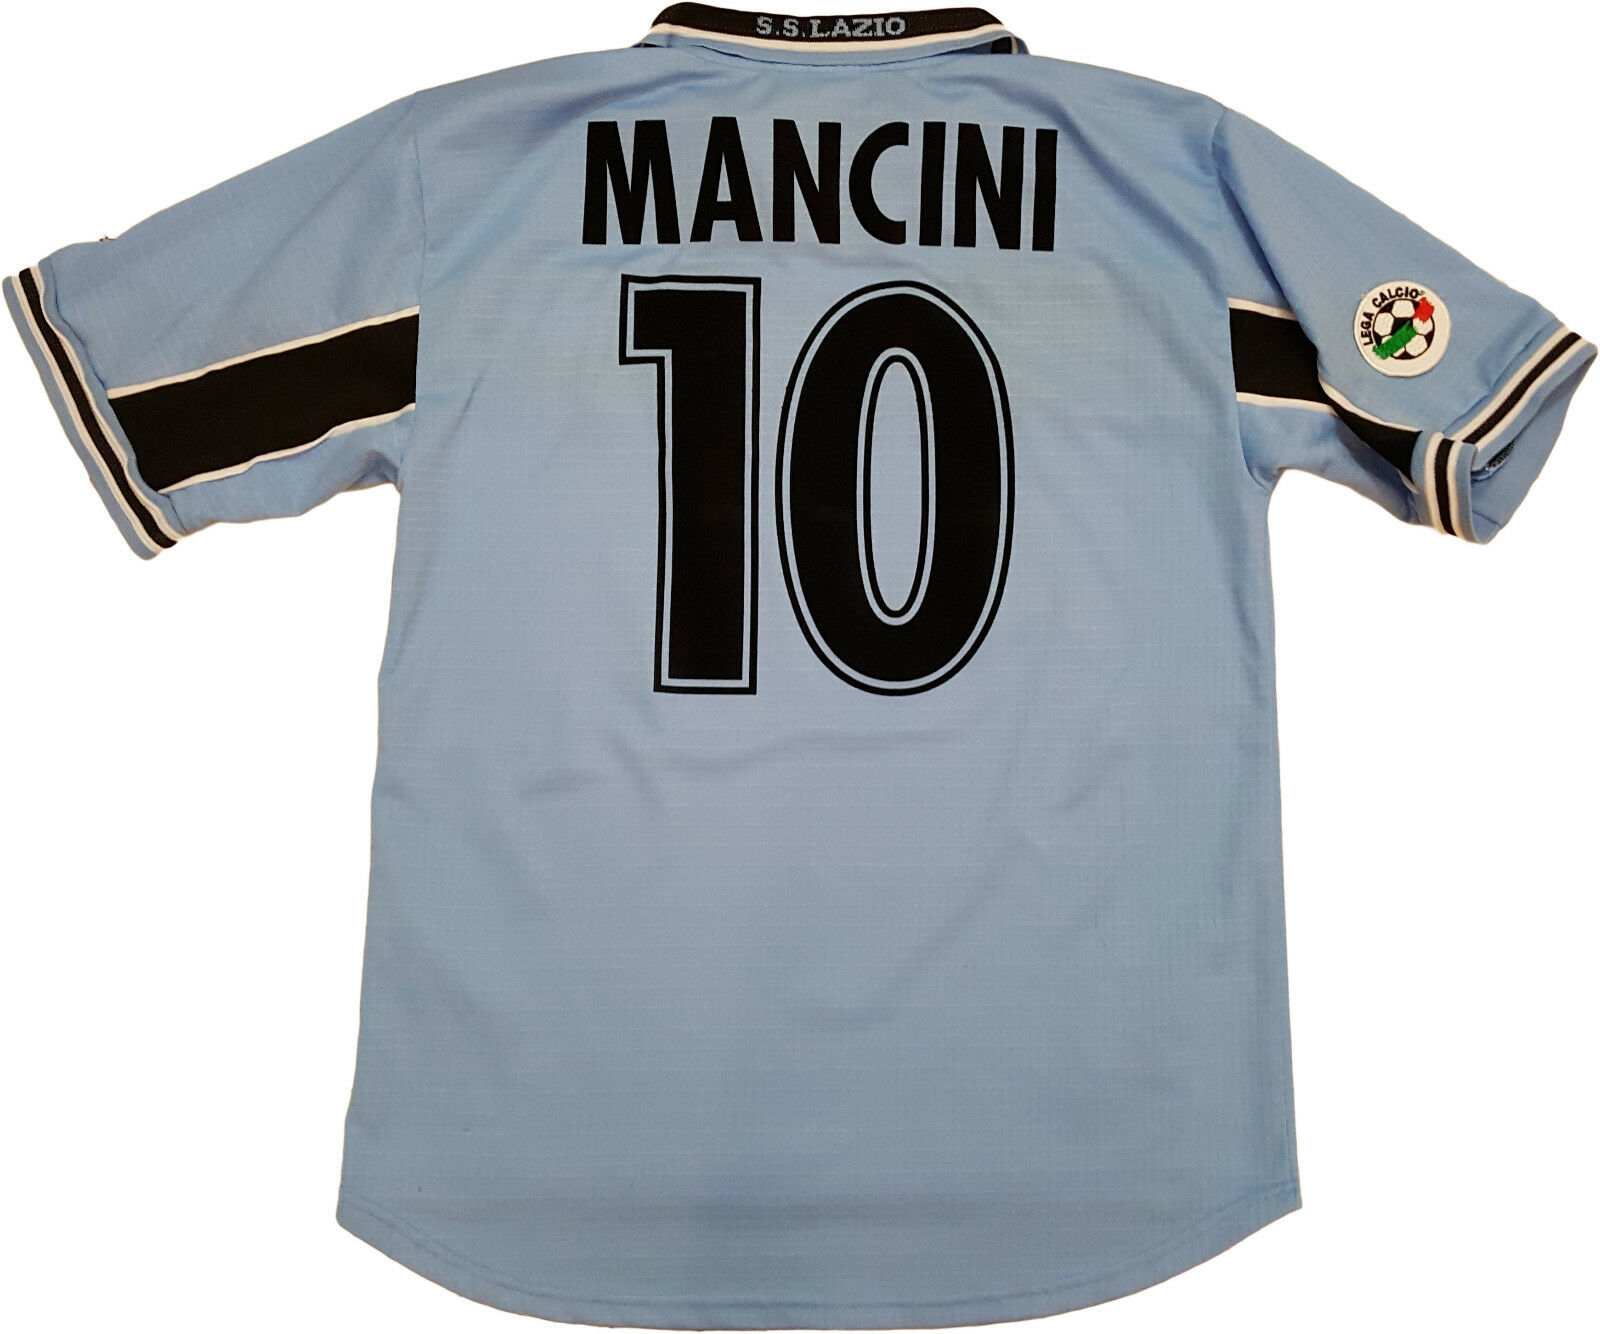 Mancini Lazio vintage Puma Cirio 1998 1999 home shirt jersey Medium